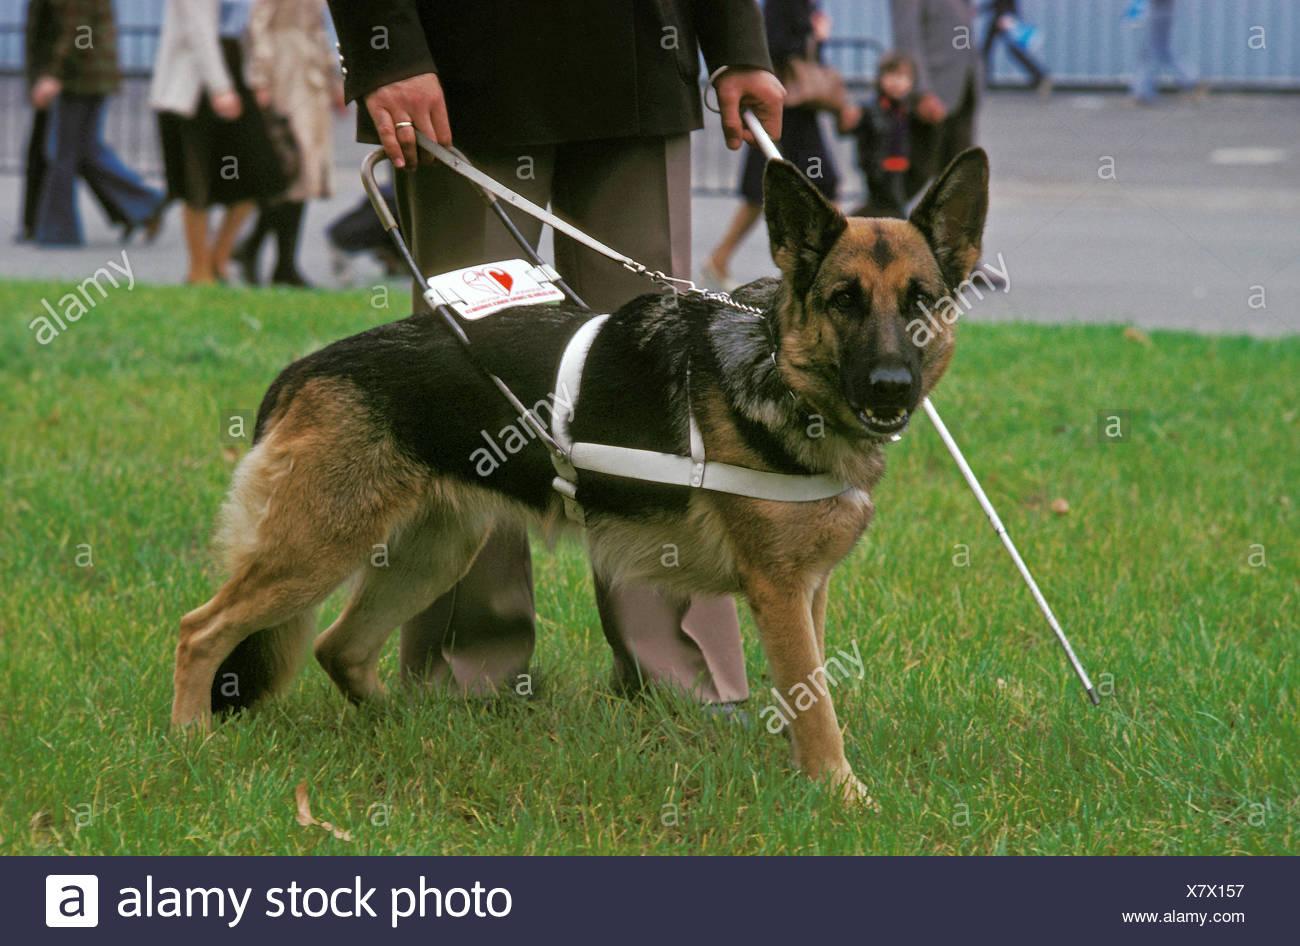 German Shepherd Dog, Guide Dog for Blind, walking with owner